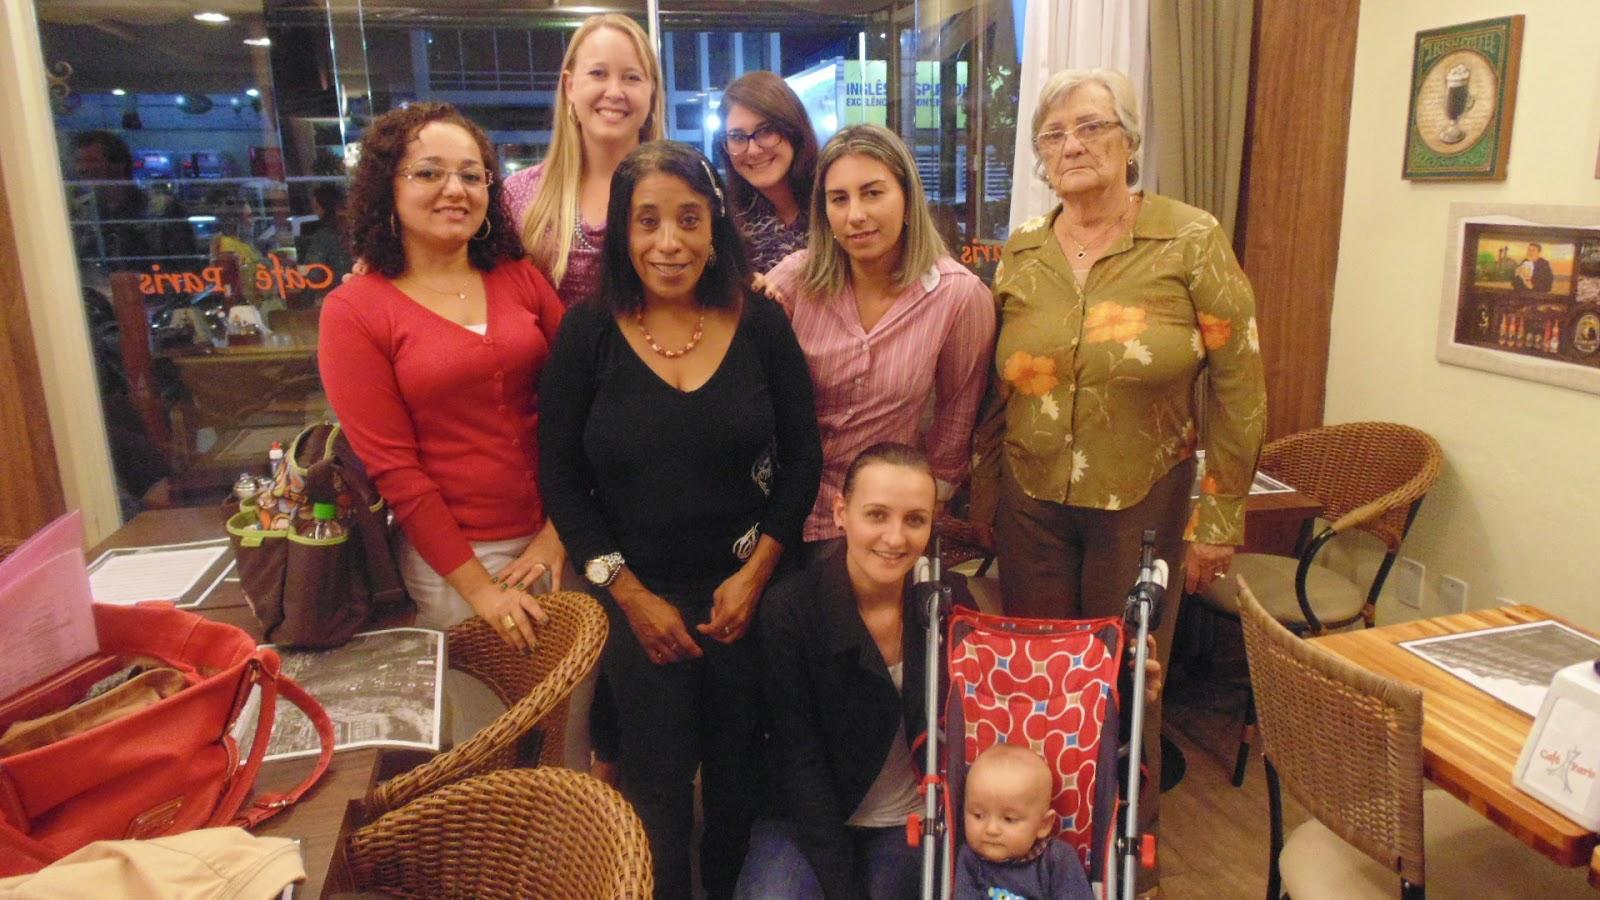 Group Of Older Women 62